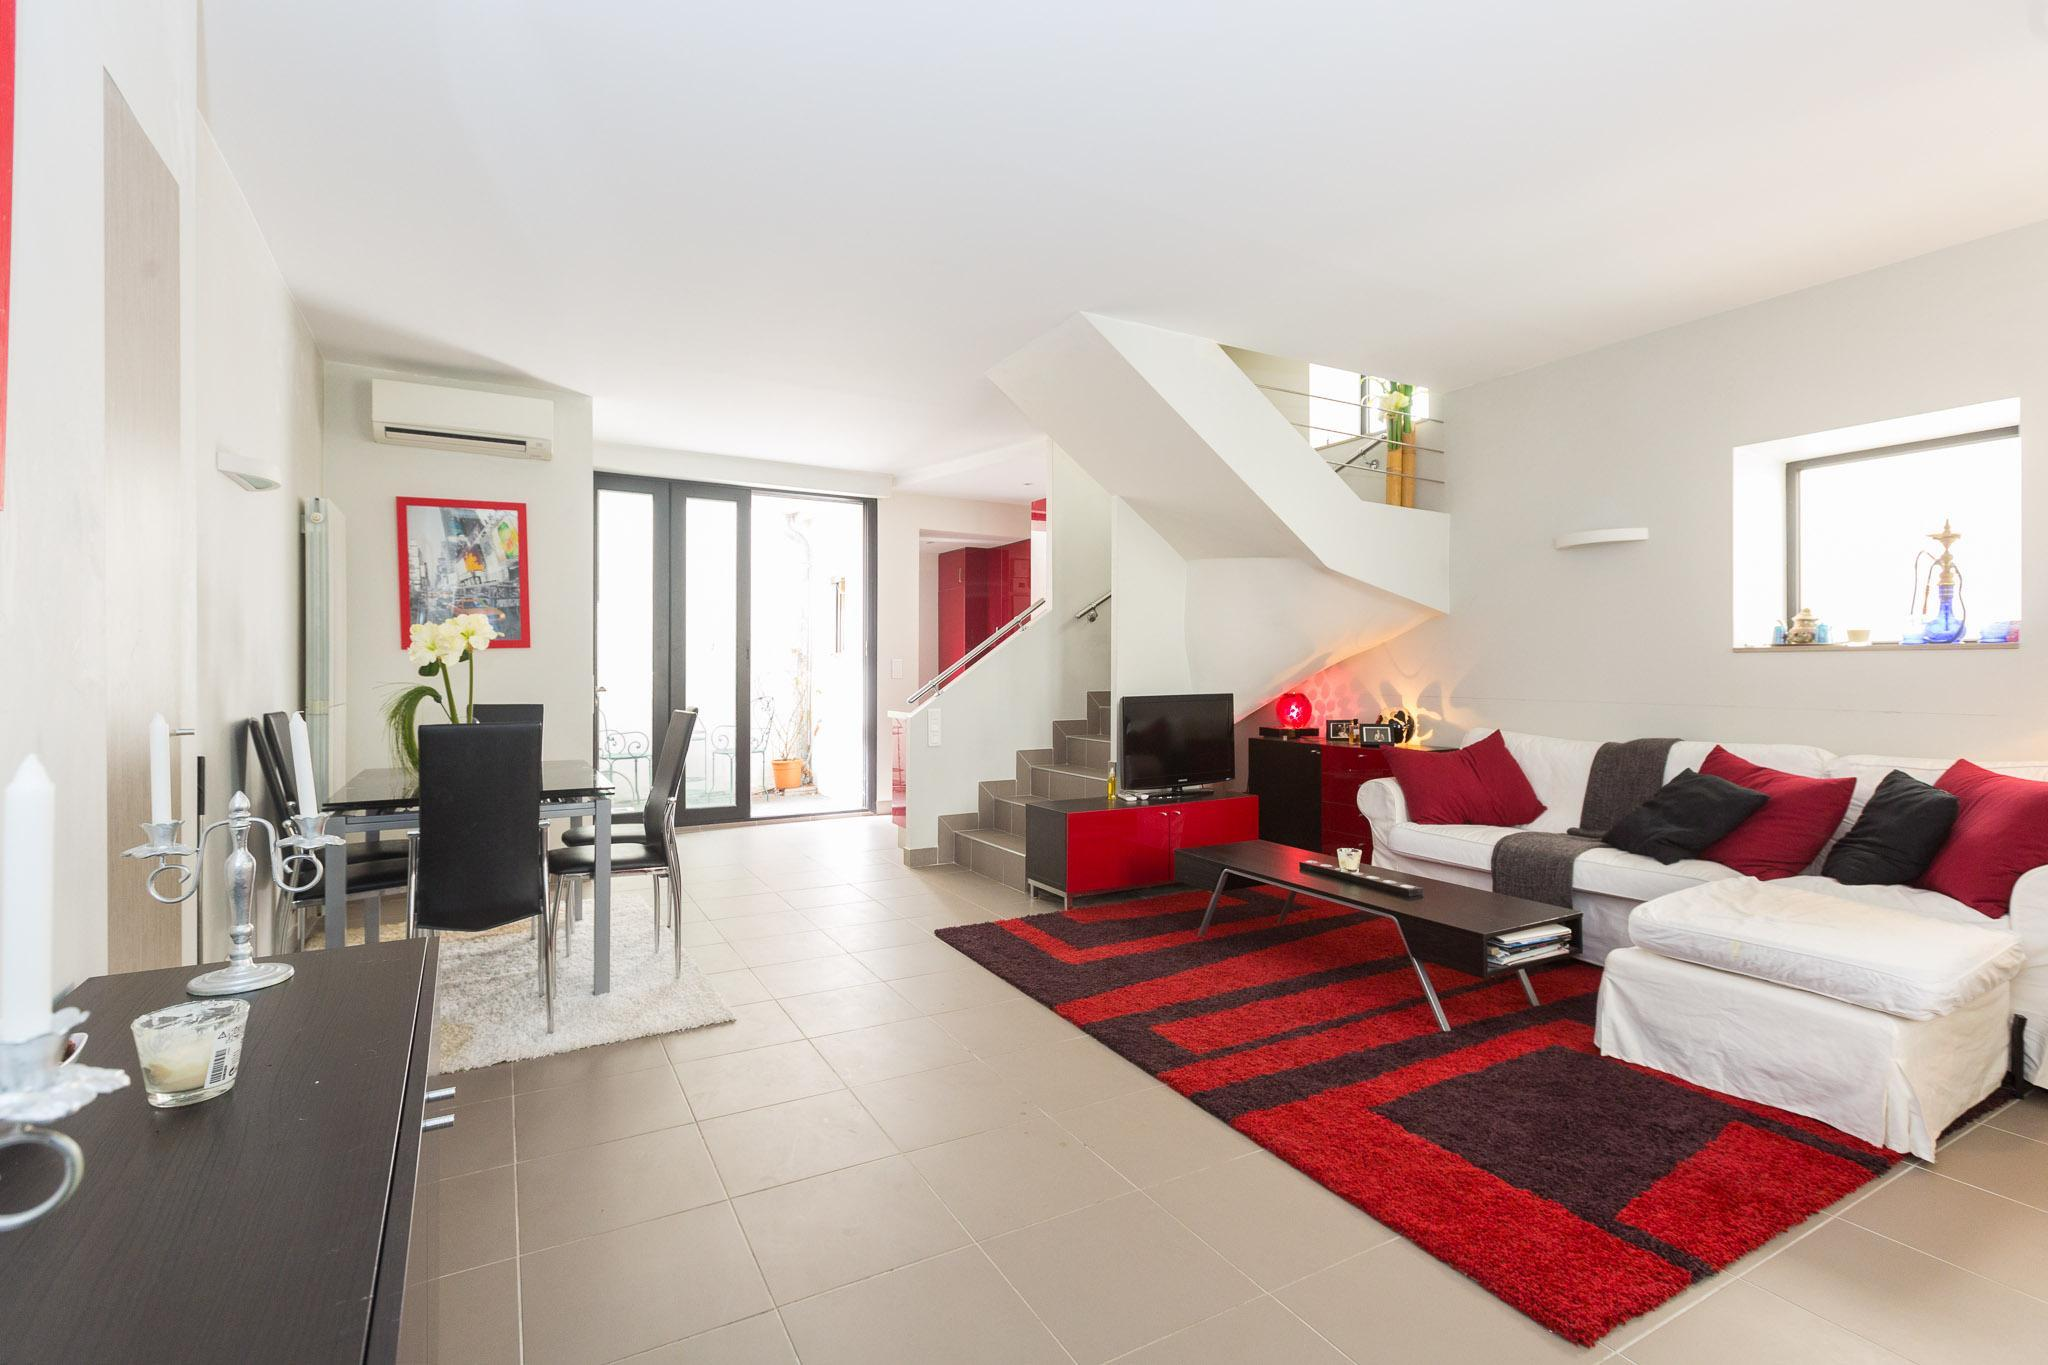 Prestigious 3BR Loft 5min Paris in Boulogne Heart